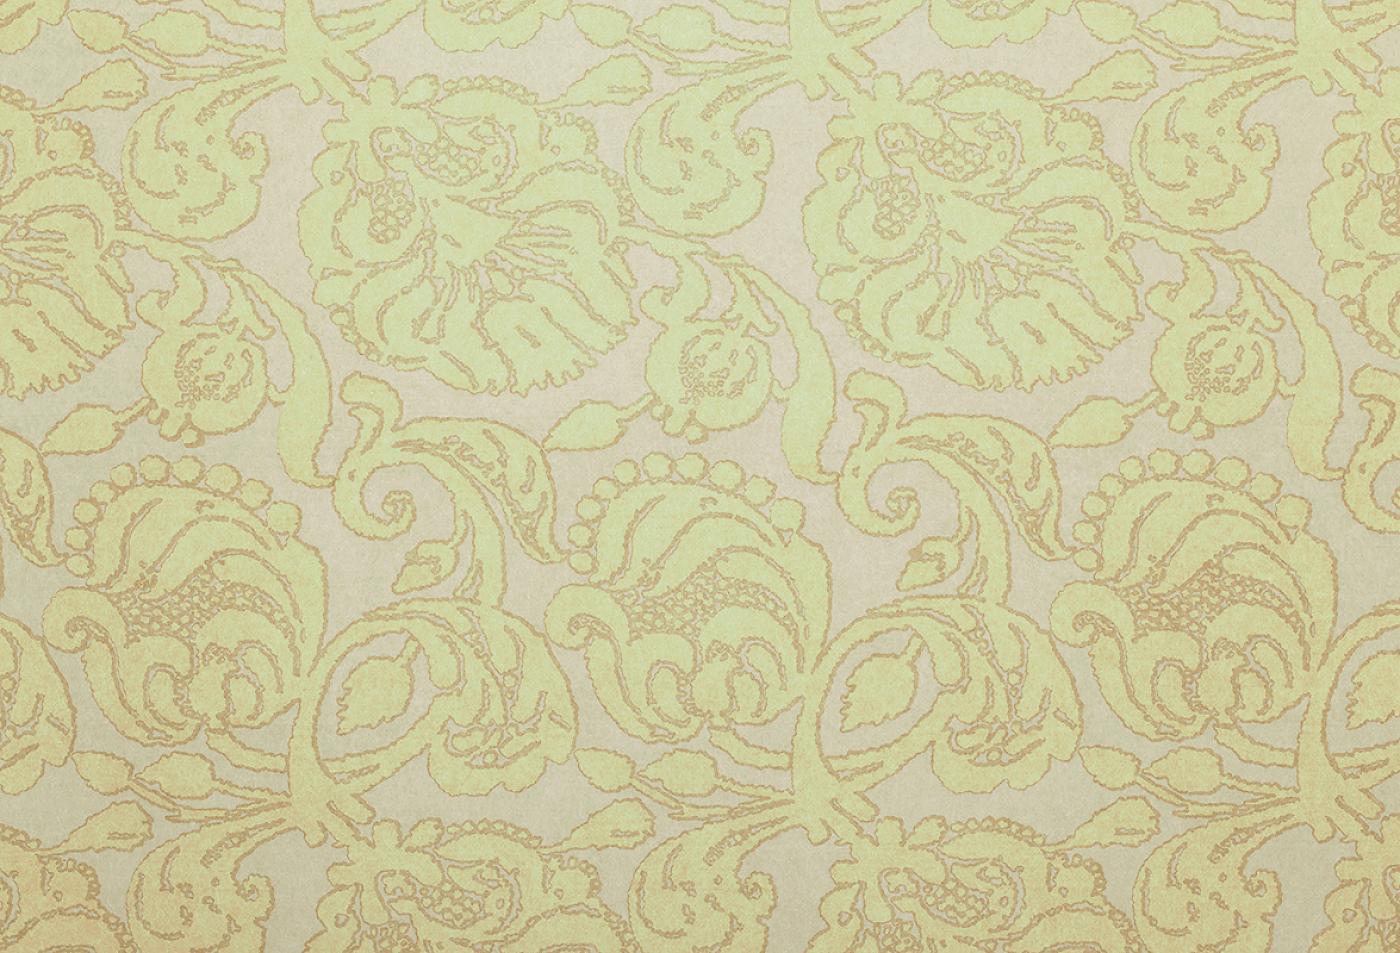 Damask wallpaper hallway ideas  Anna Wallpaper  Christopher Farr Cloth  Future house hallway